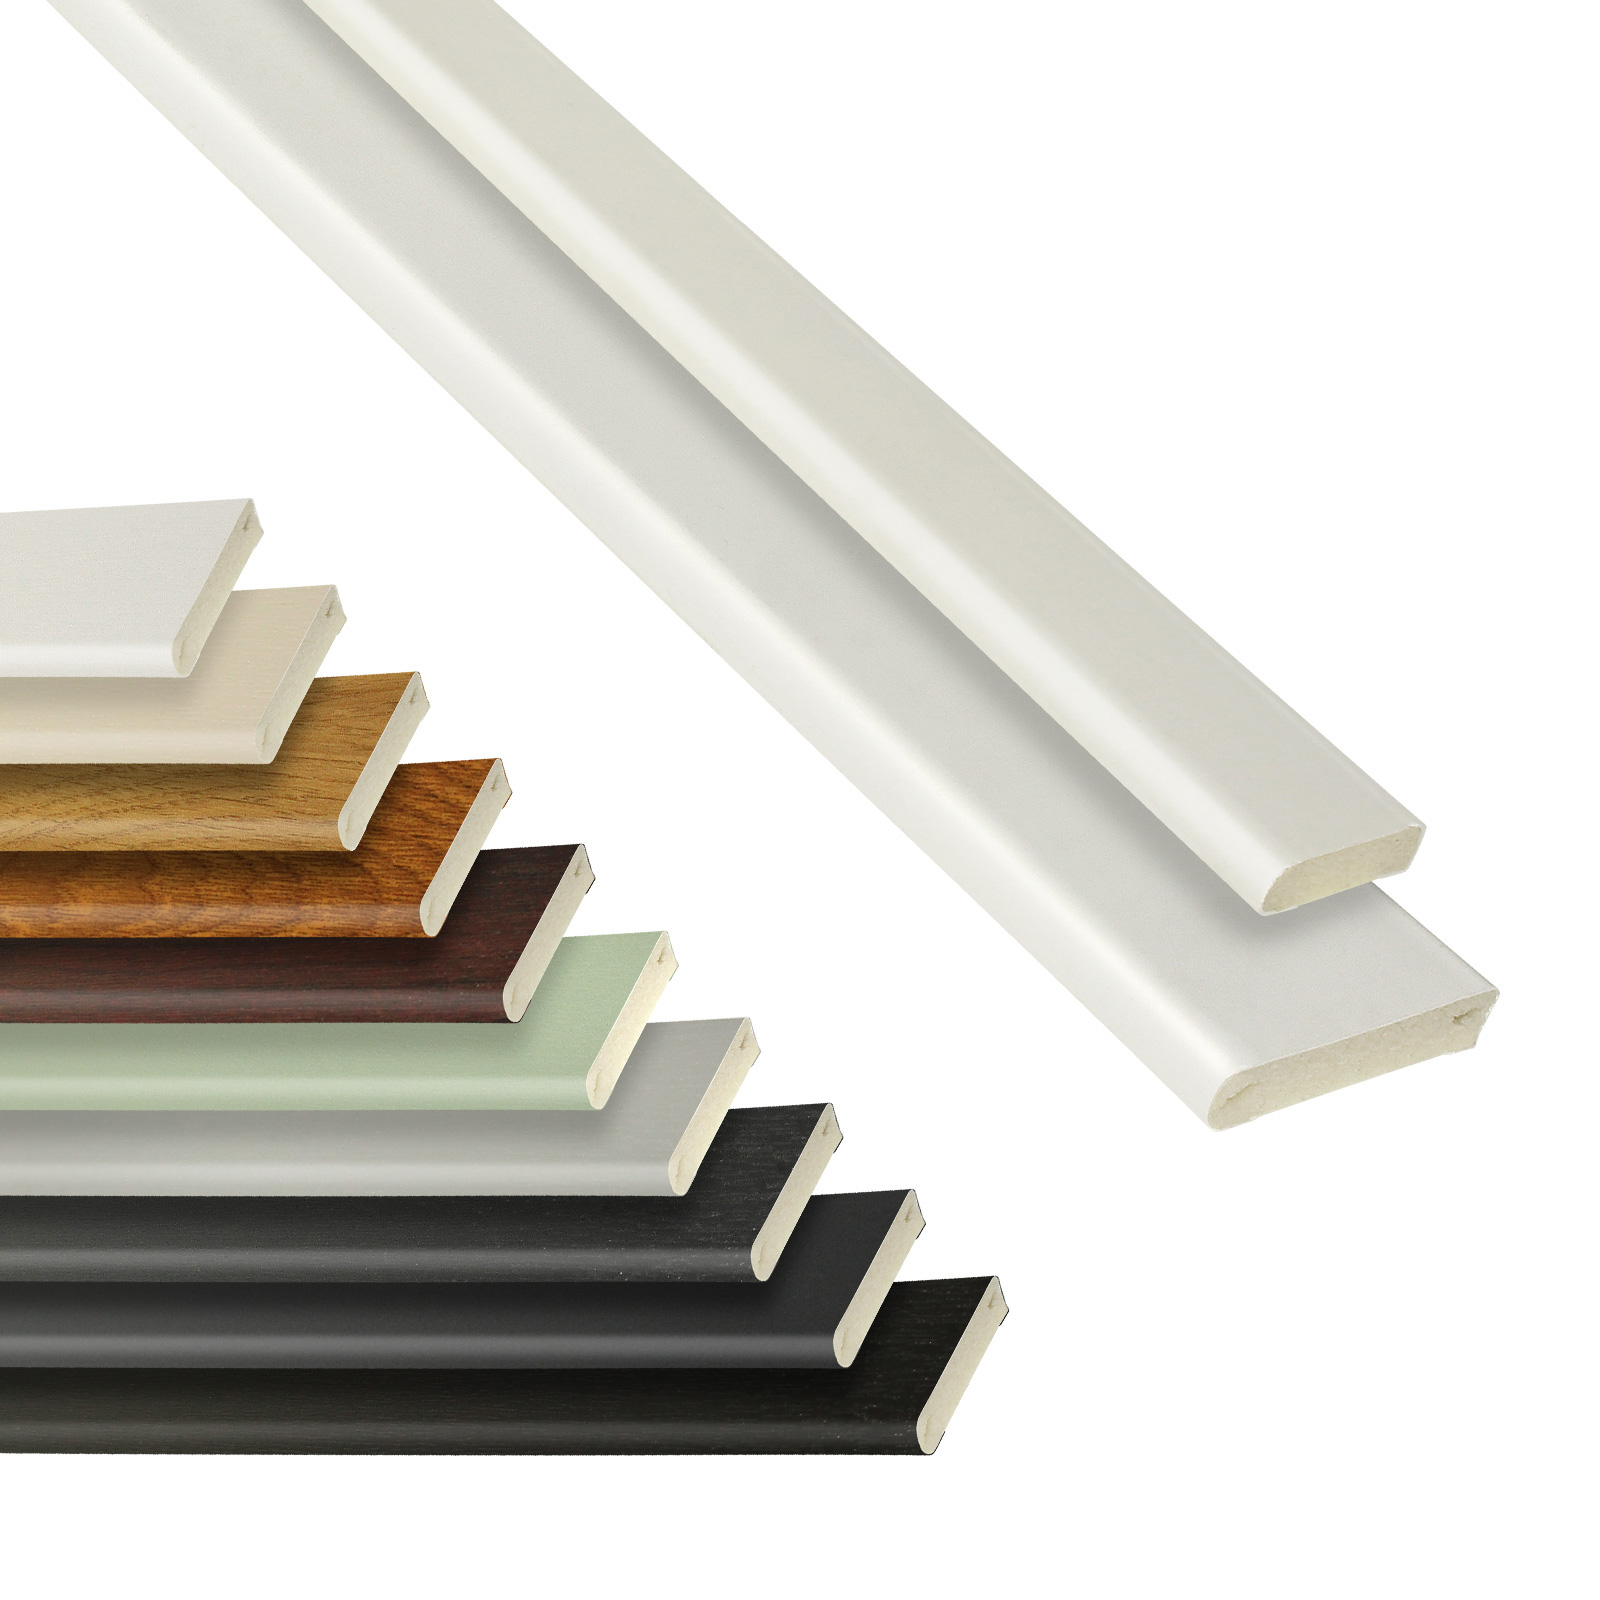 Architrave PVC Fillet finish Window UPVC 20mm Anthrasite Grey 30mm.